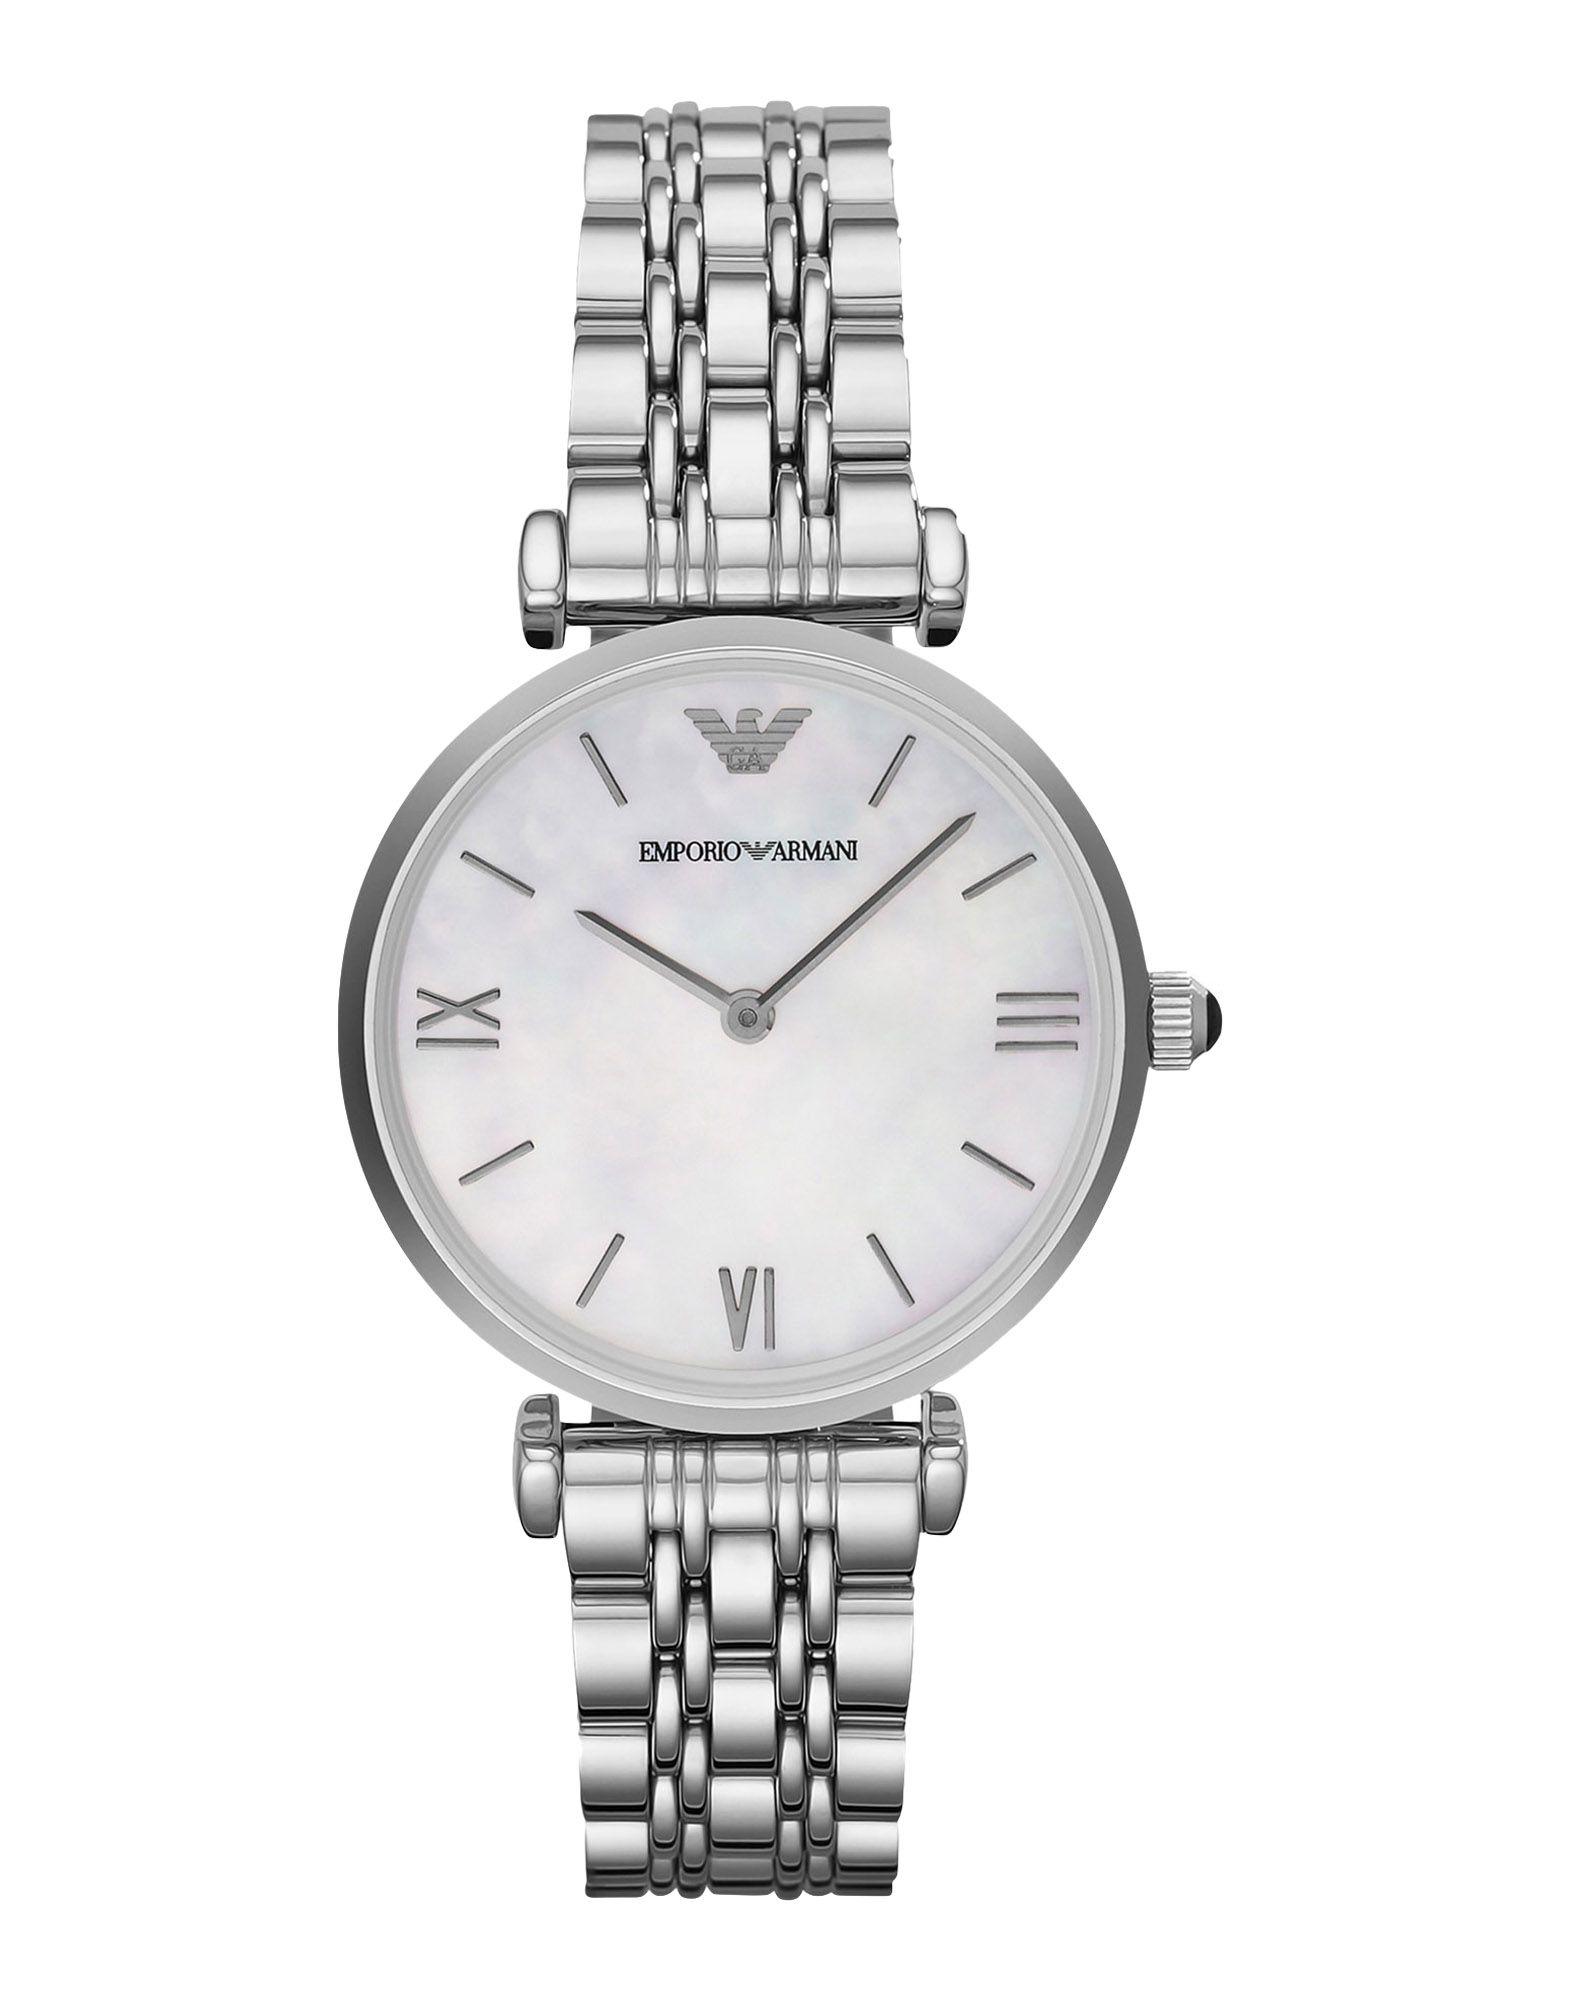 EMPORIO ARMANI Wrist watches